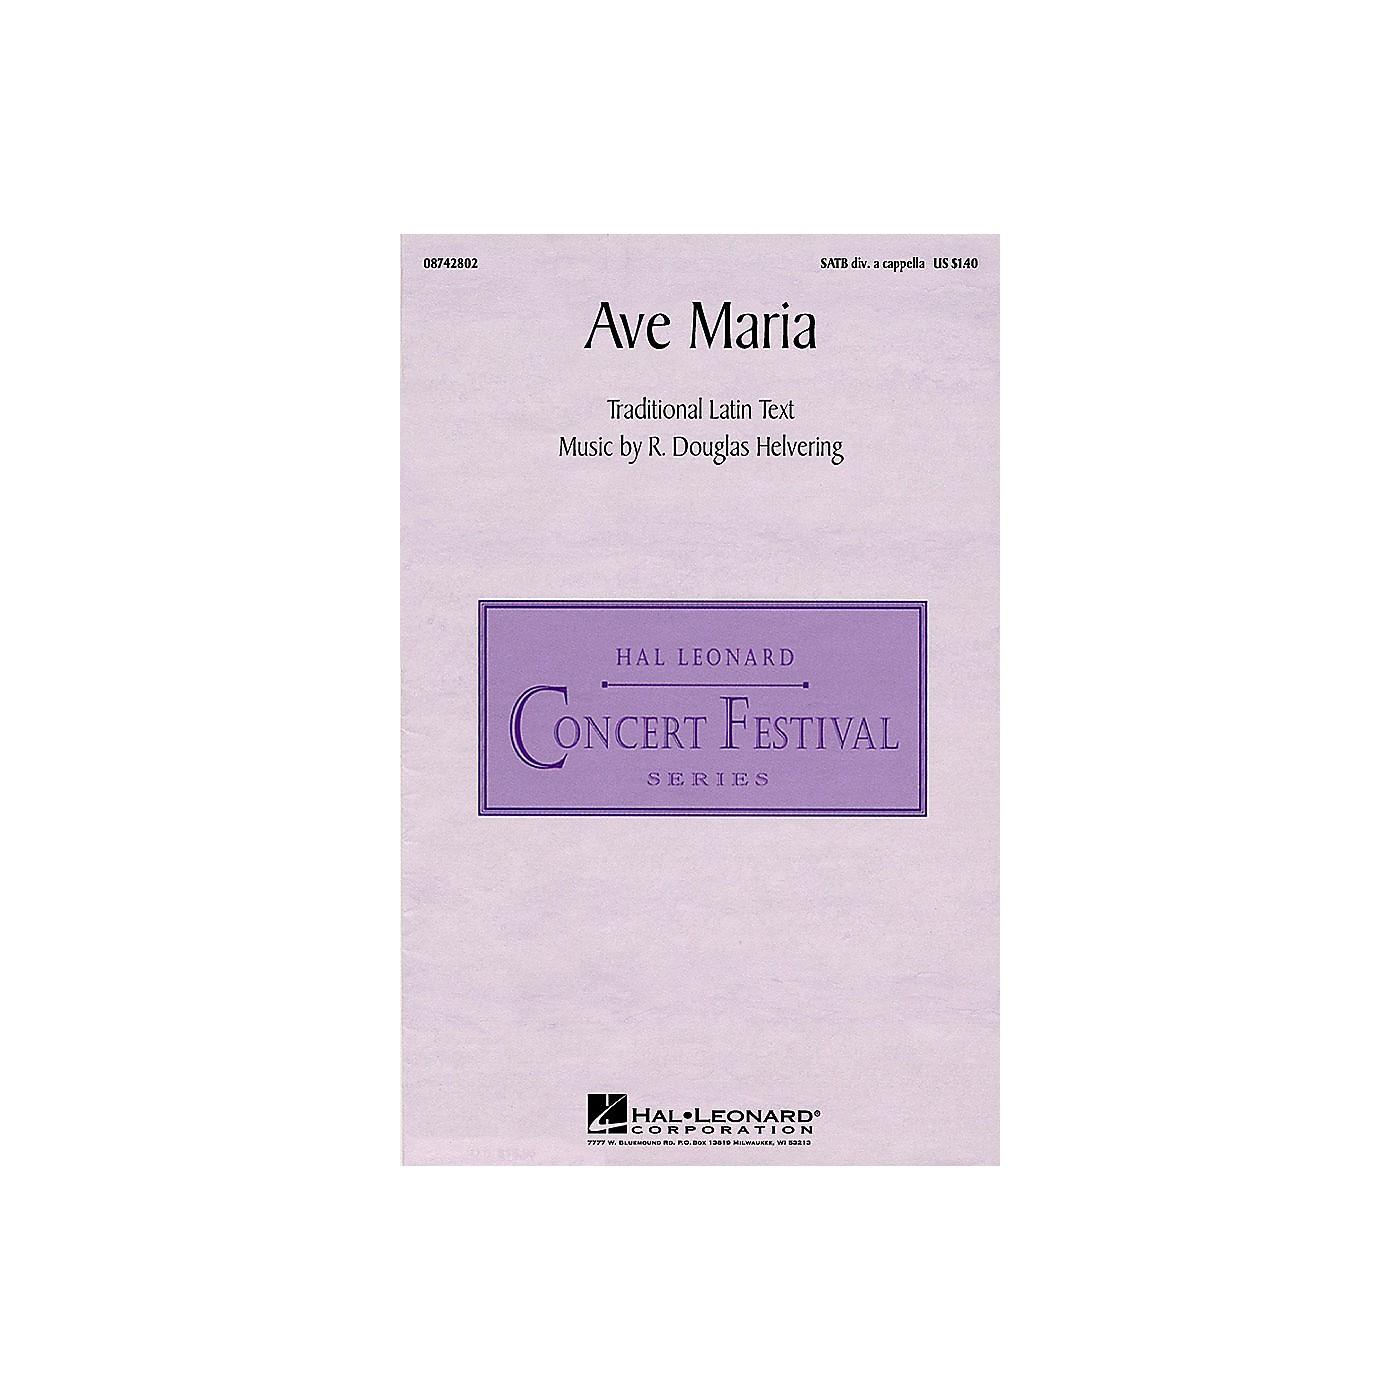 Hal Leonard Ave Maria (SATB divisi) SATB DV A Cappella composed by R. Douglas Helvering thumbnail